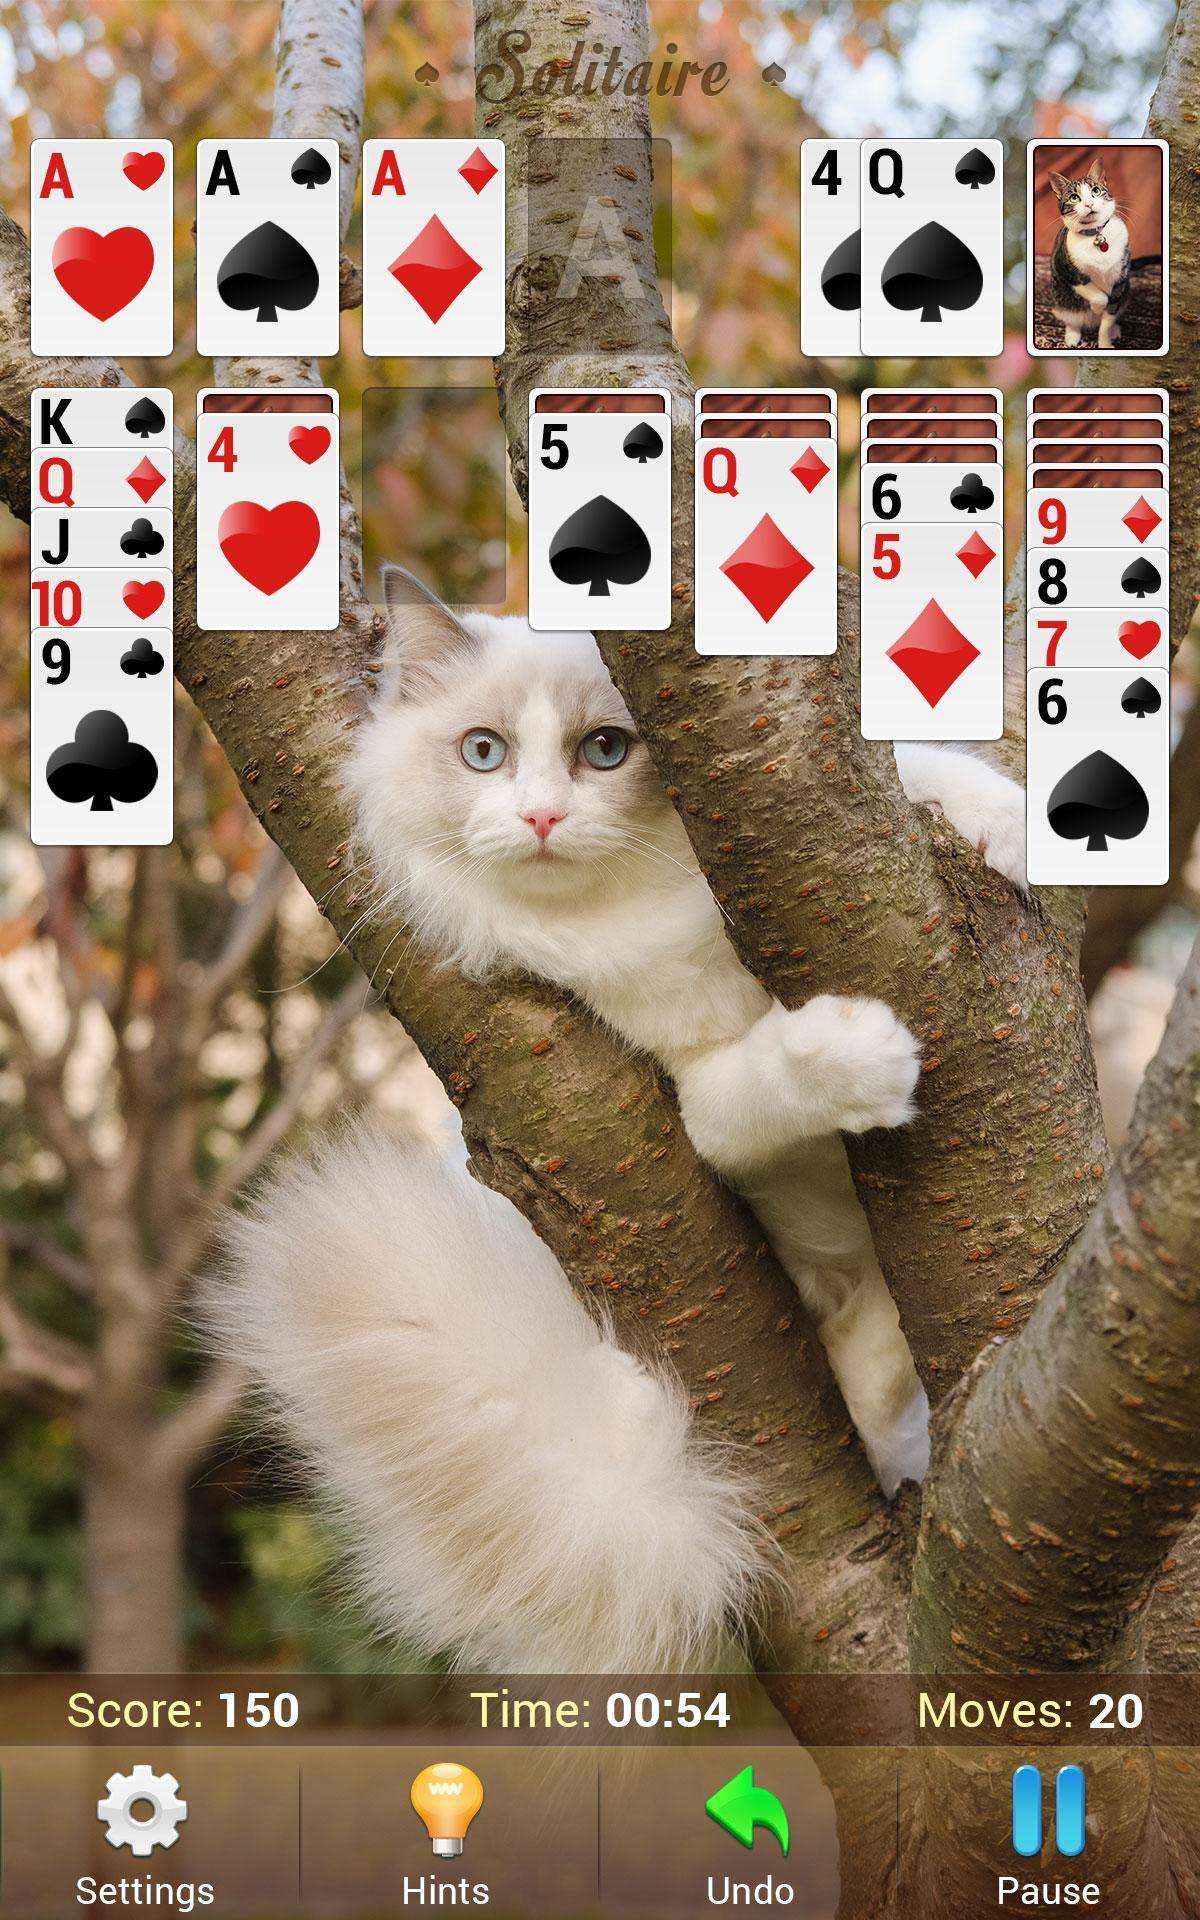 Solitaire Classic Klondike Solitaire Card Game 1.0.27 Screenshot 23